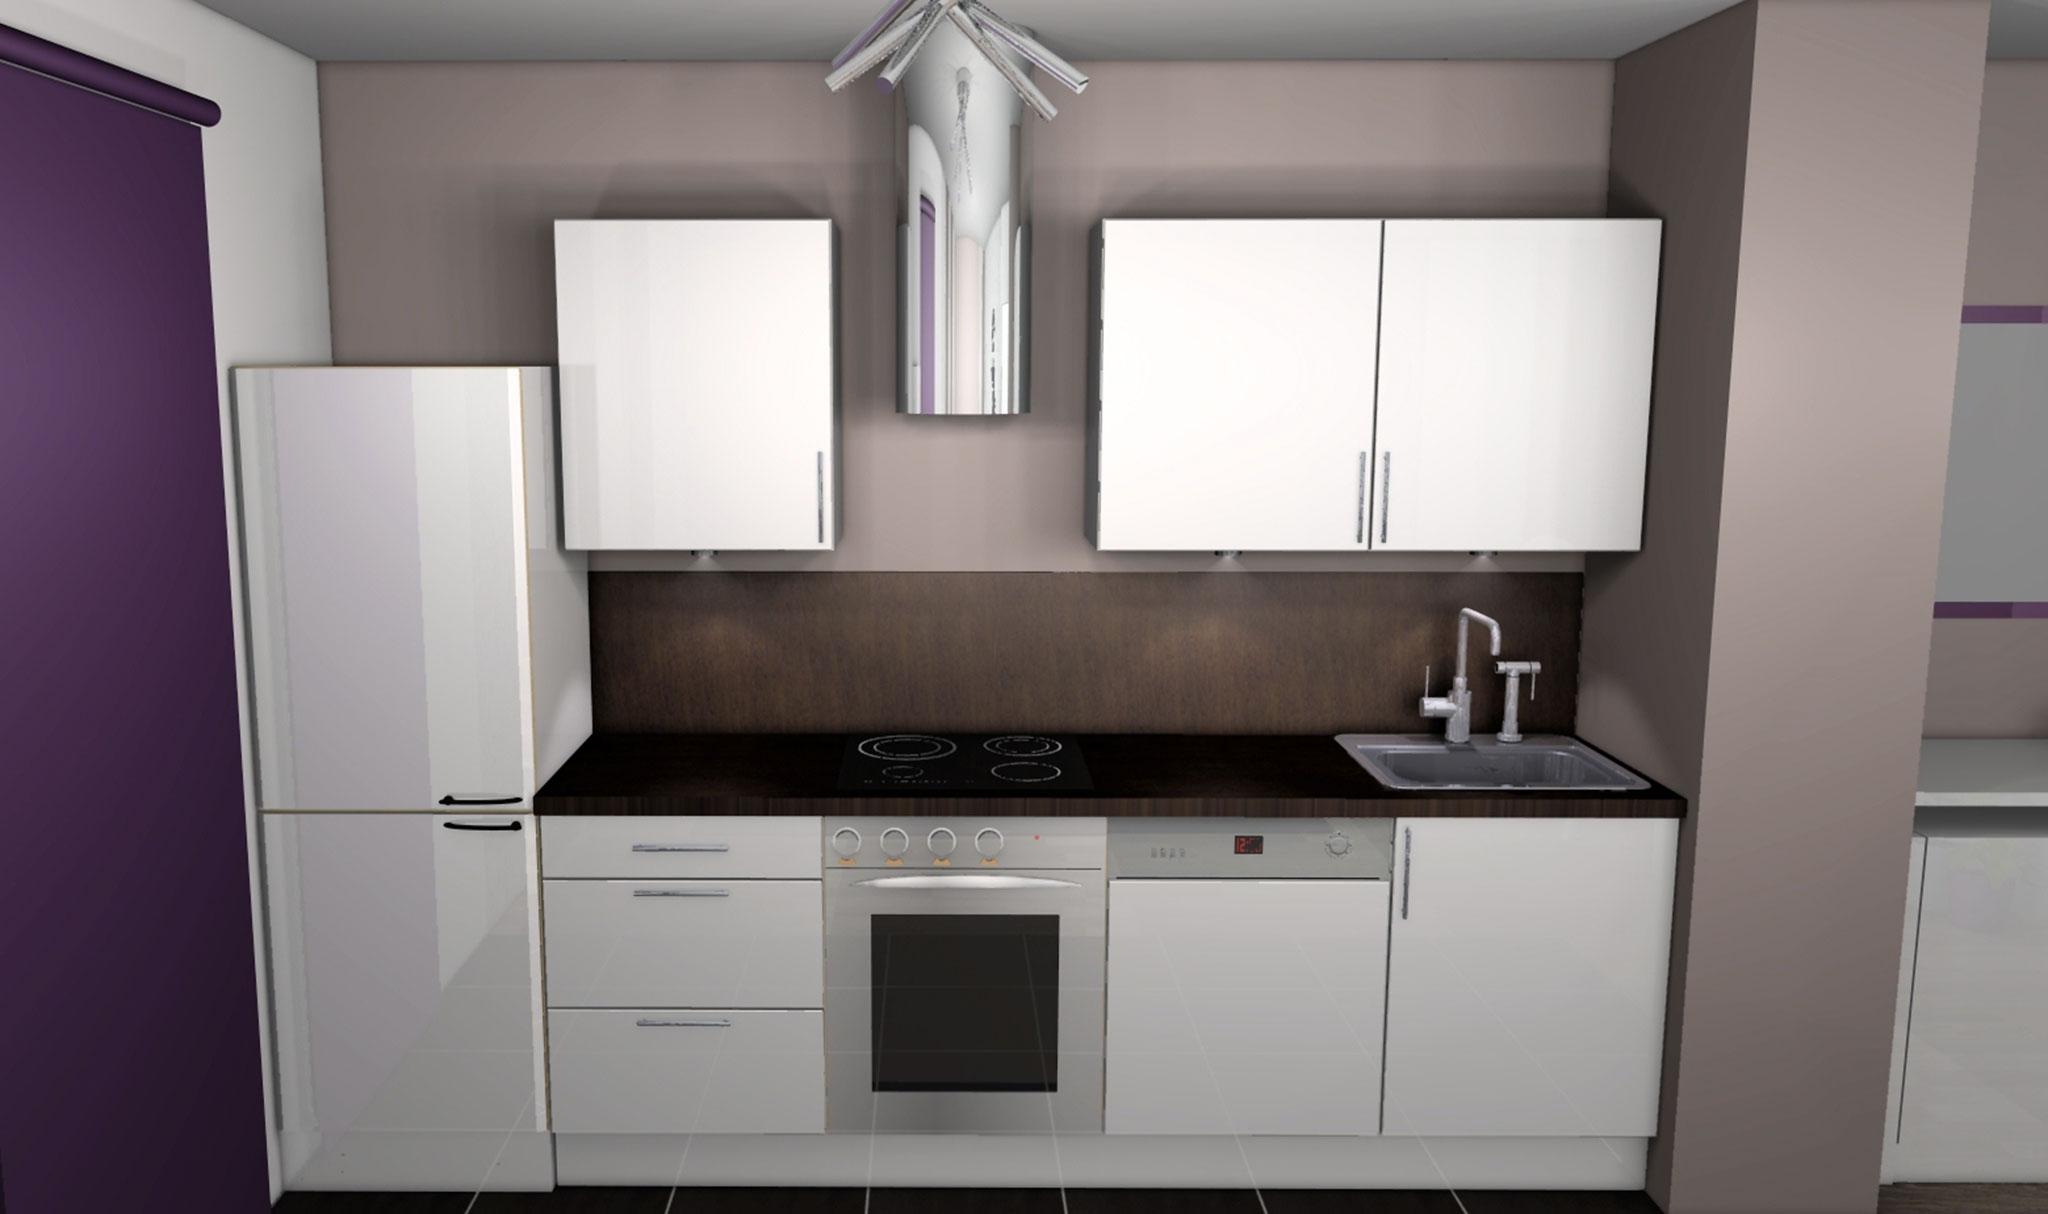 Photo cuisine blanche mur taupe - Atwebster.fr - Maison et mobilier